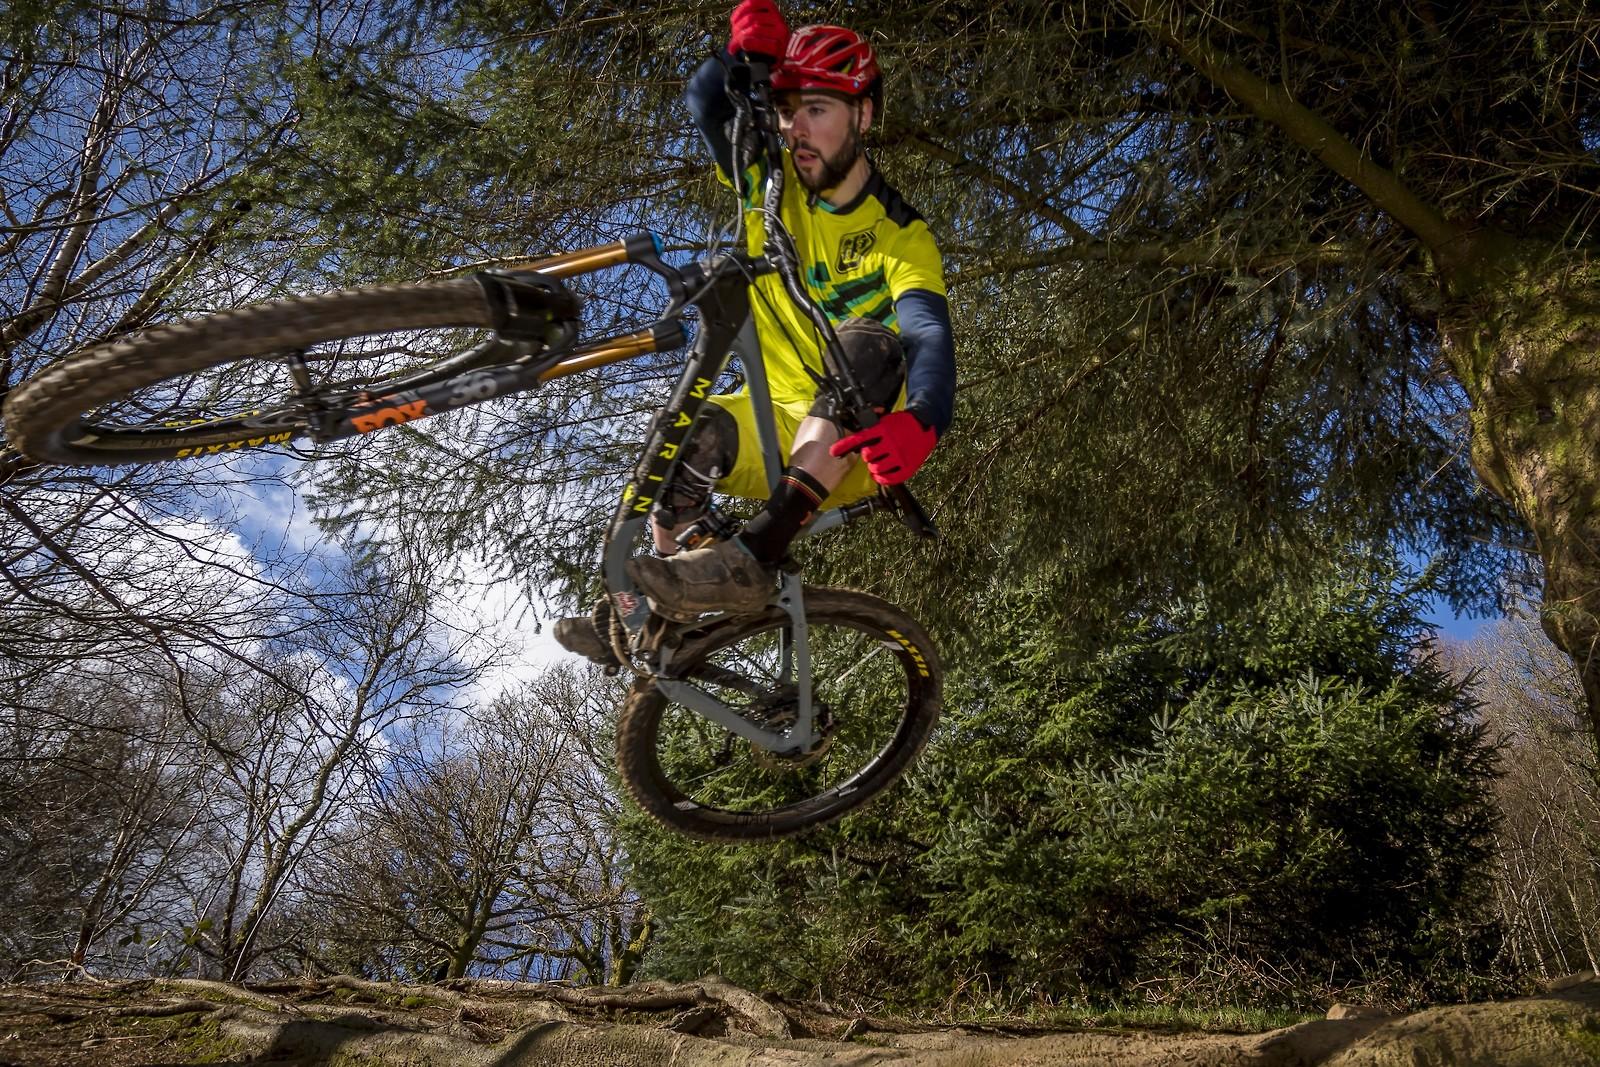 DSC0292 - robbarkerimages2017 - Mountain Biking Pictures - Vital MTB